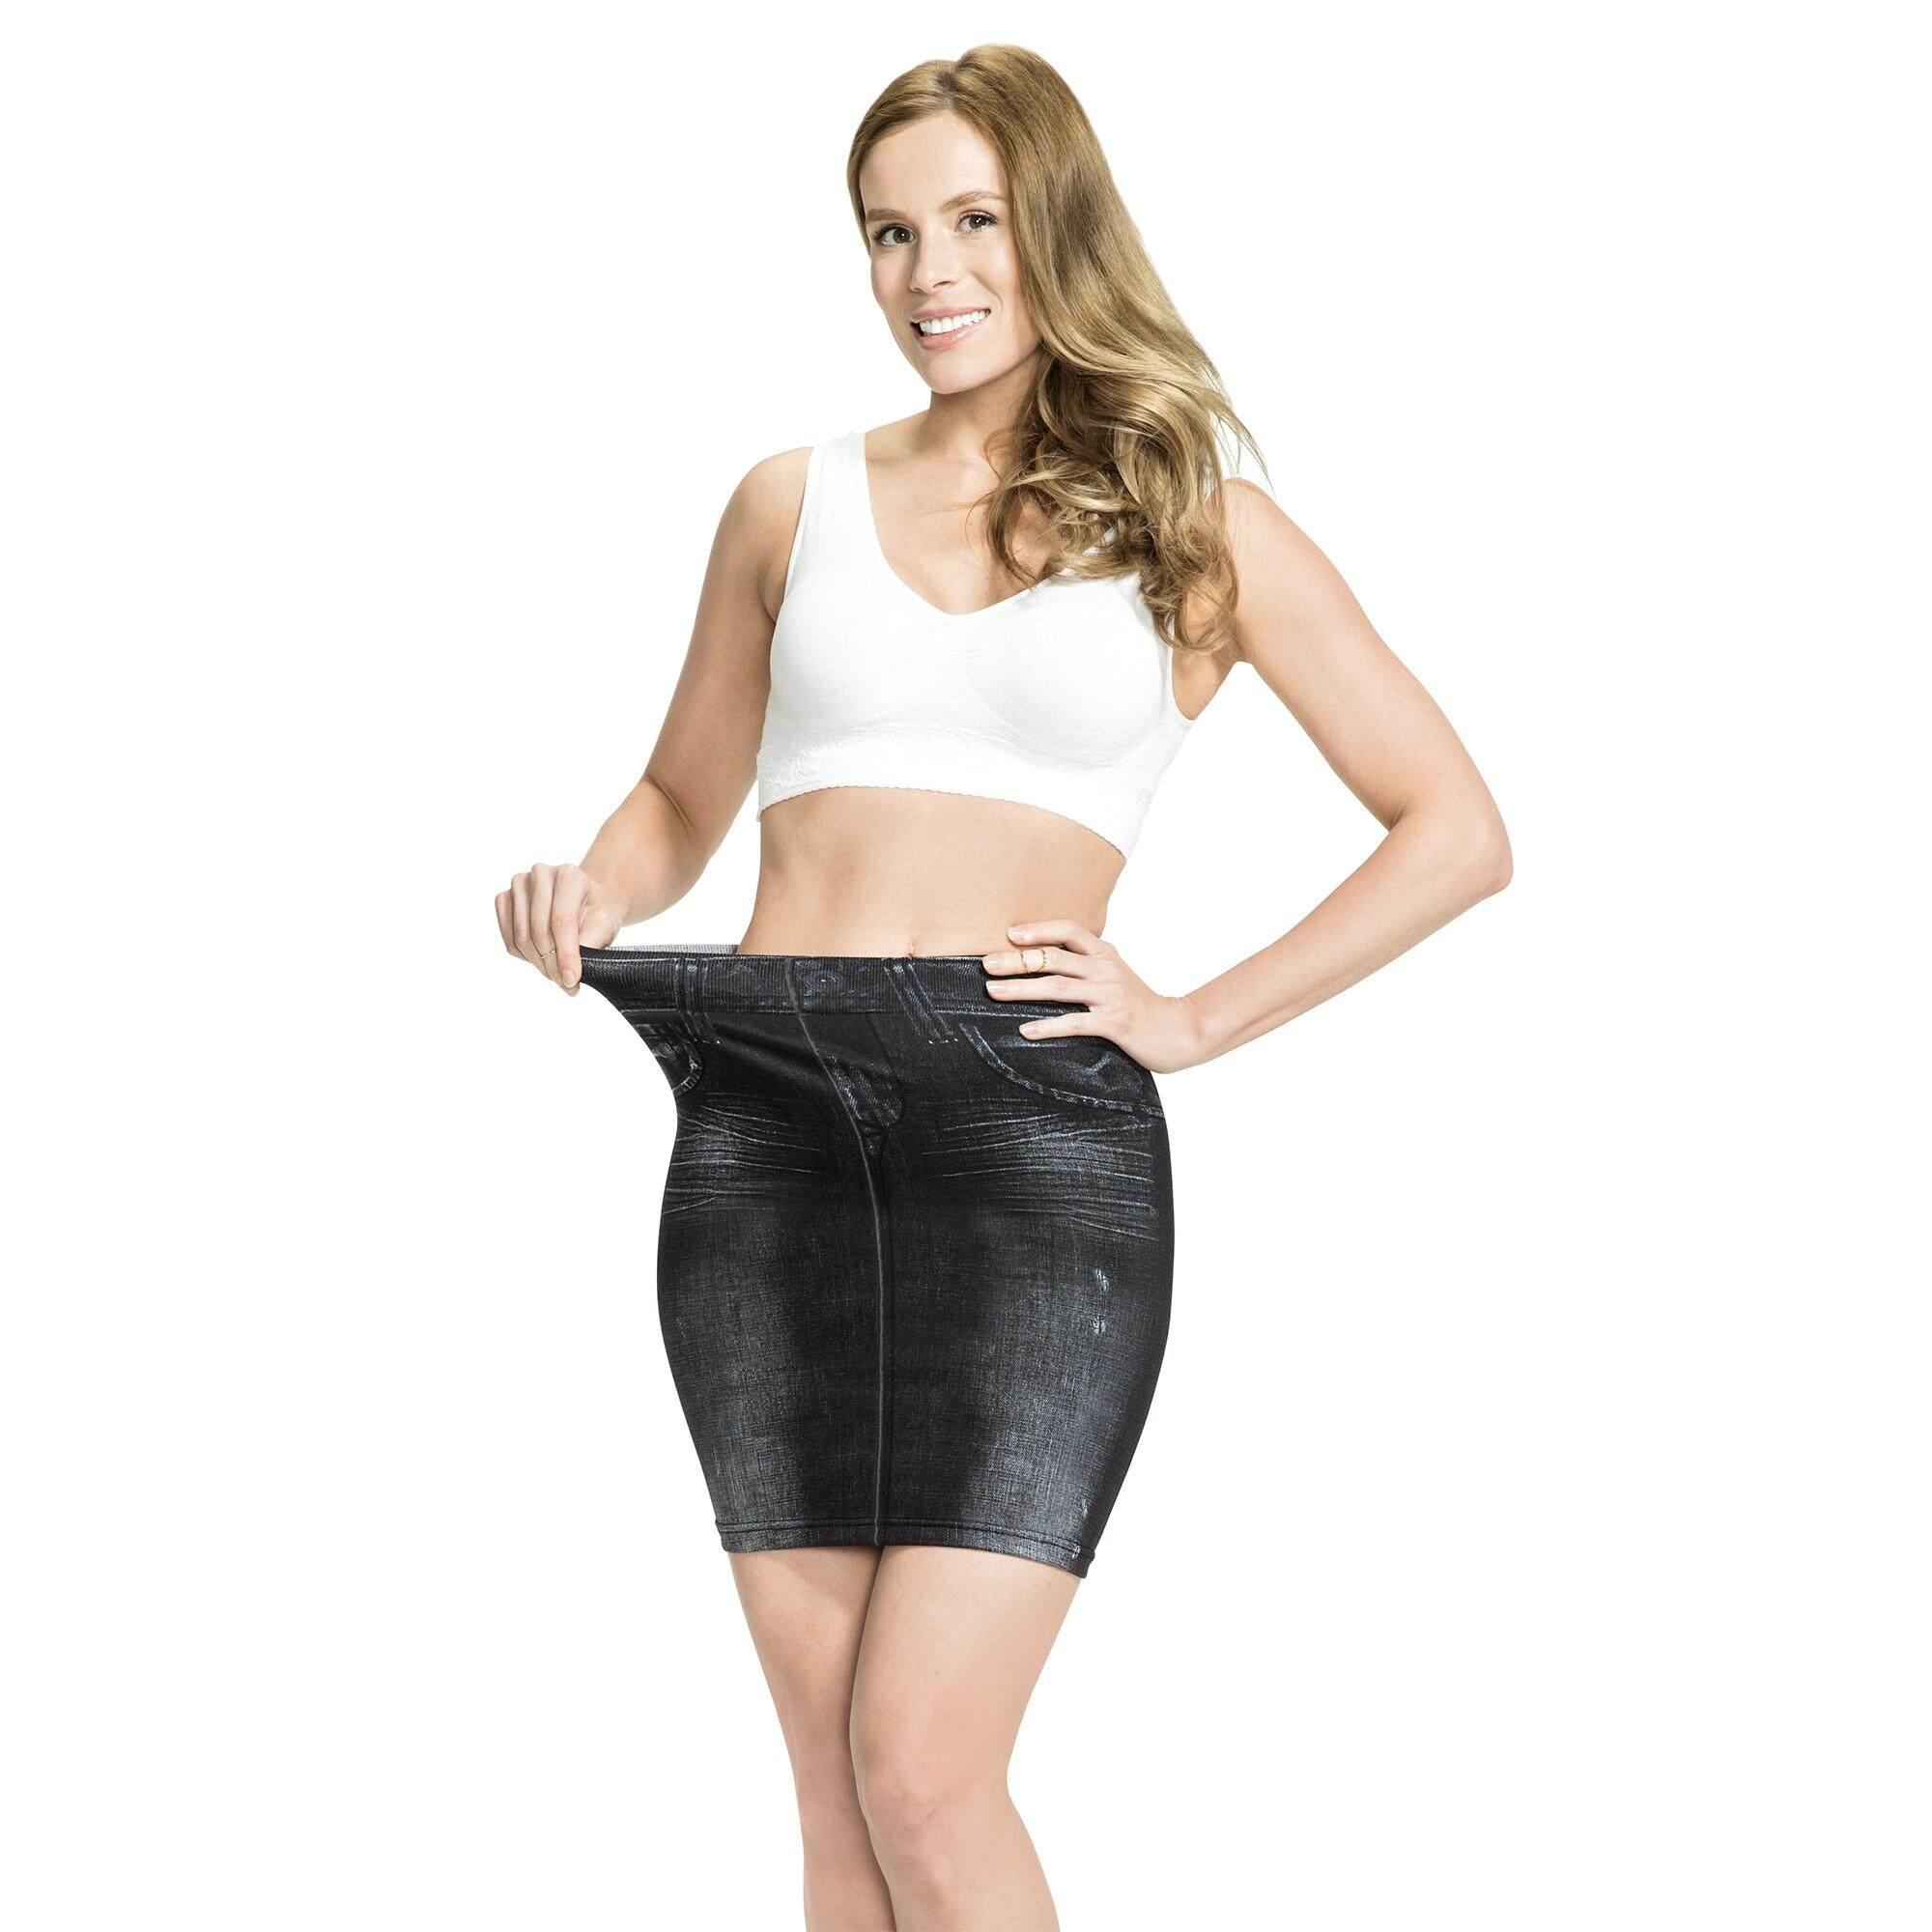 Trim n Slim Shaper Skirt Black